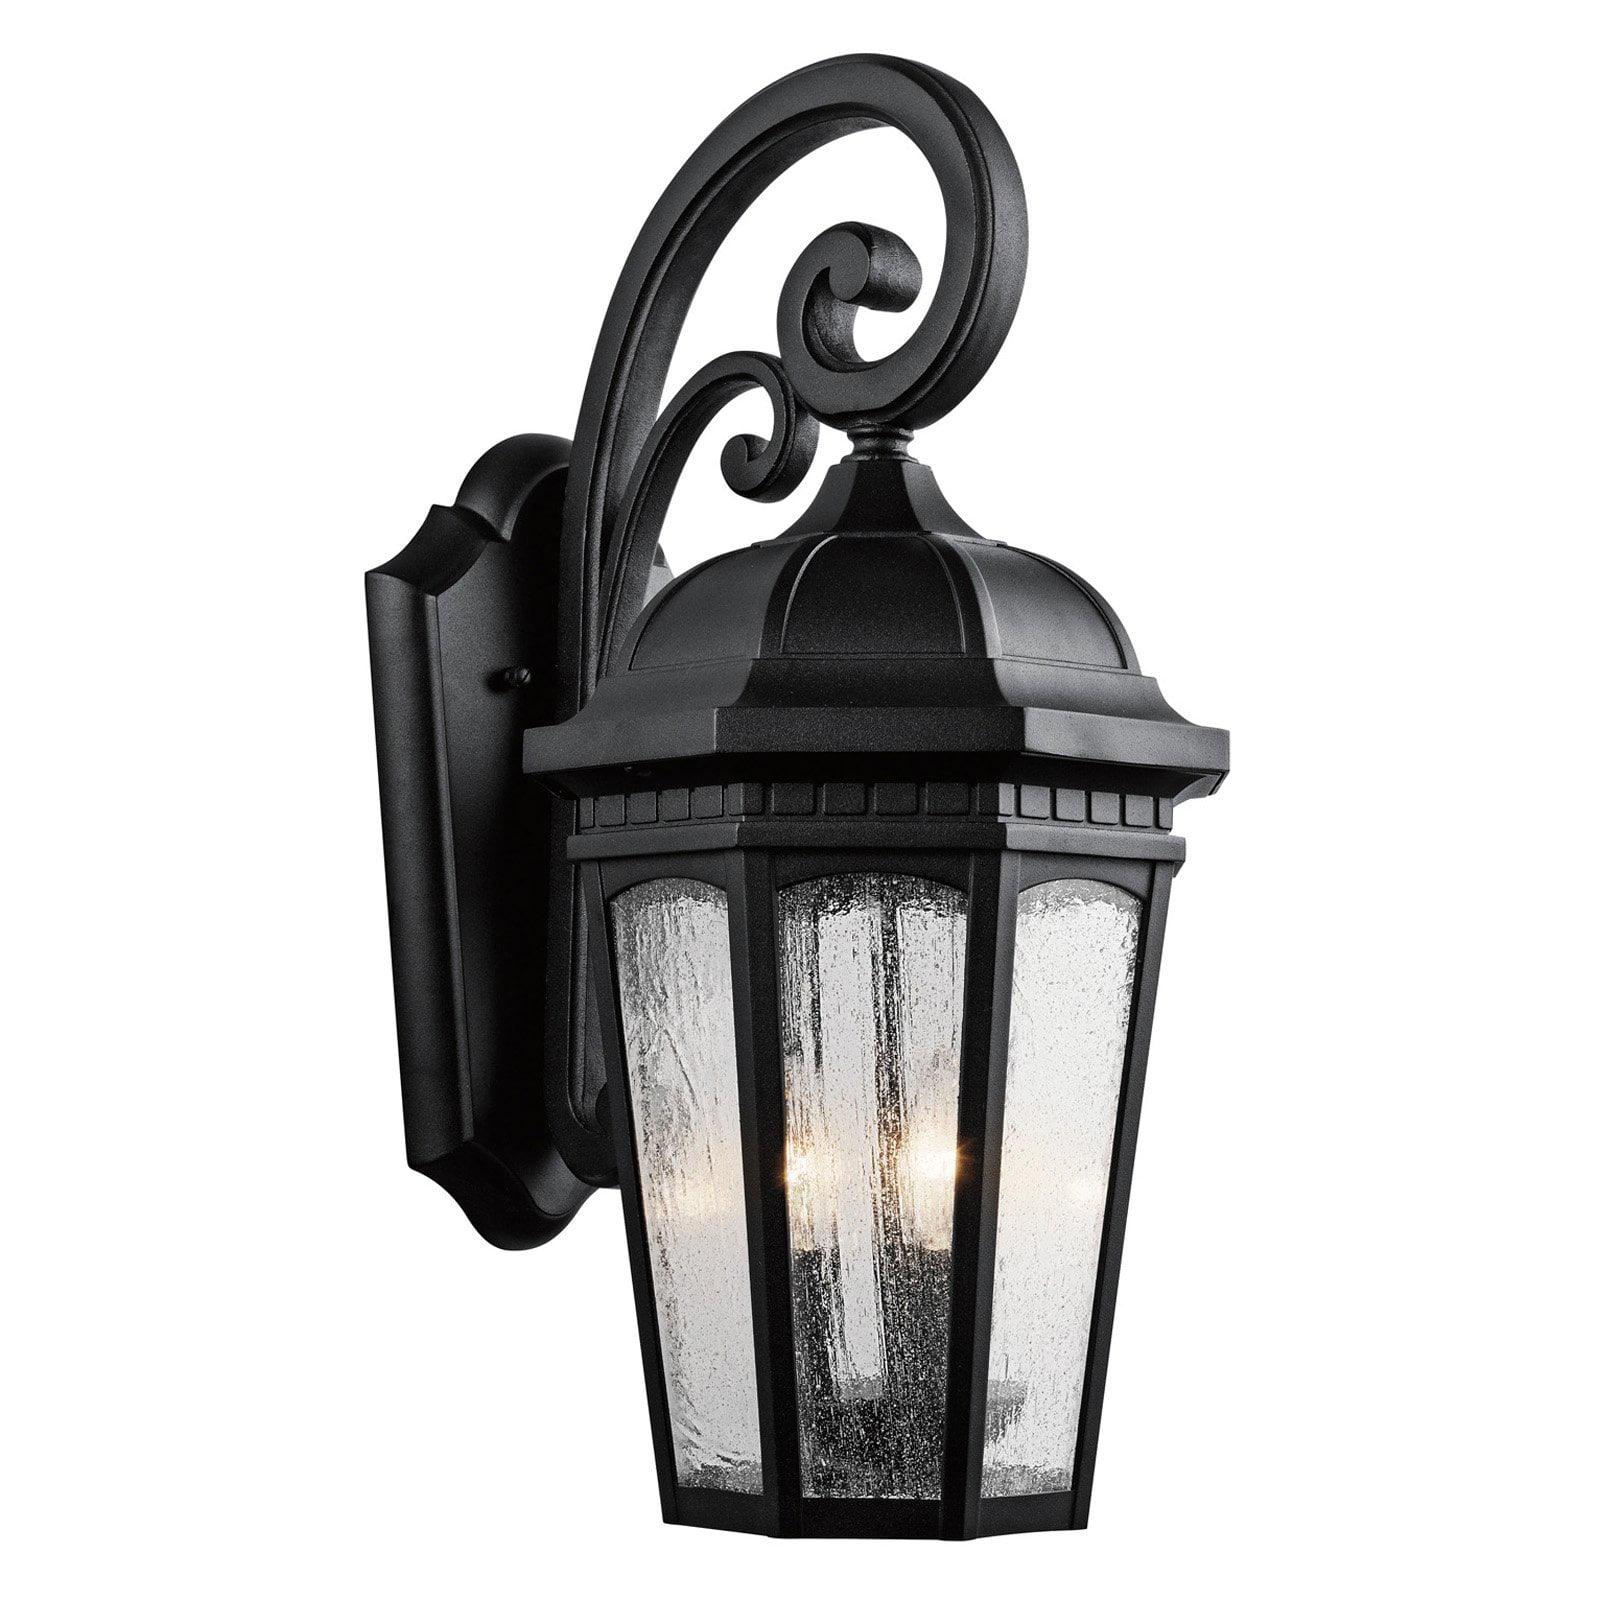 Kichler Courtyard 903 3 Light Outdoor Wall Lantern